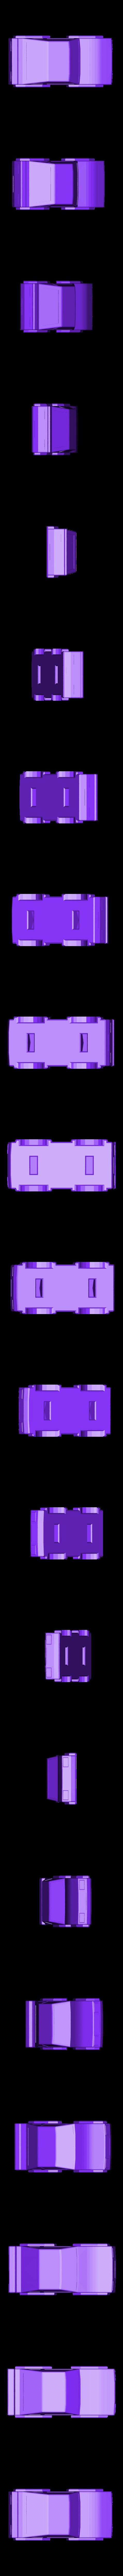 SmallToys-BodyCar2.stl Download STL file SmallToys - Cars pack • 3D print design, Wabby